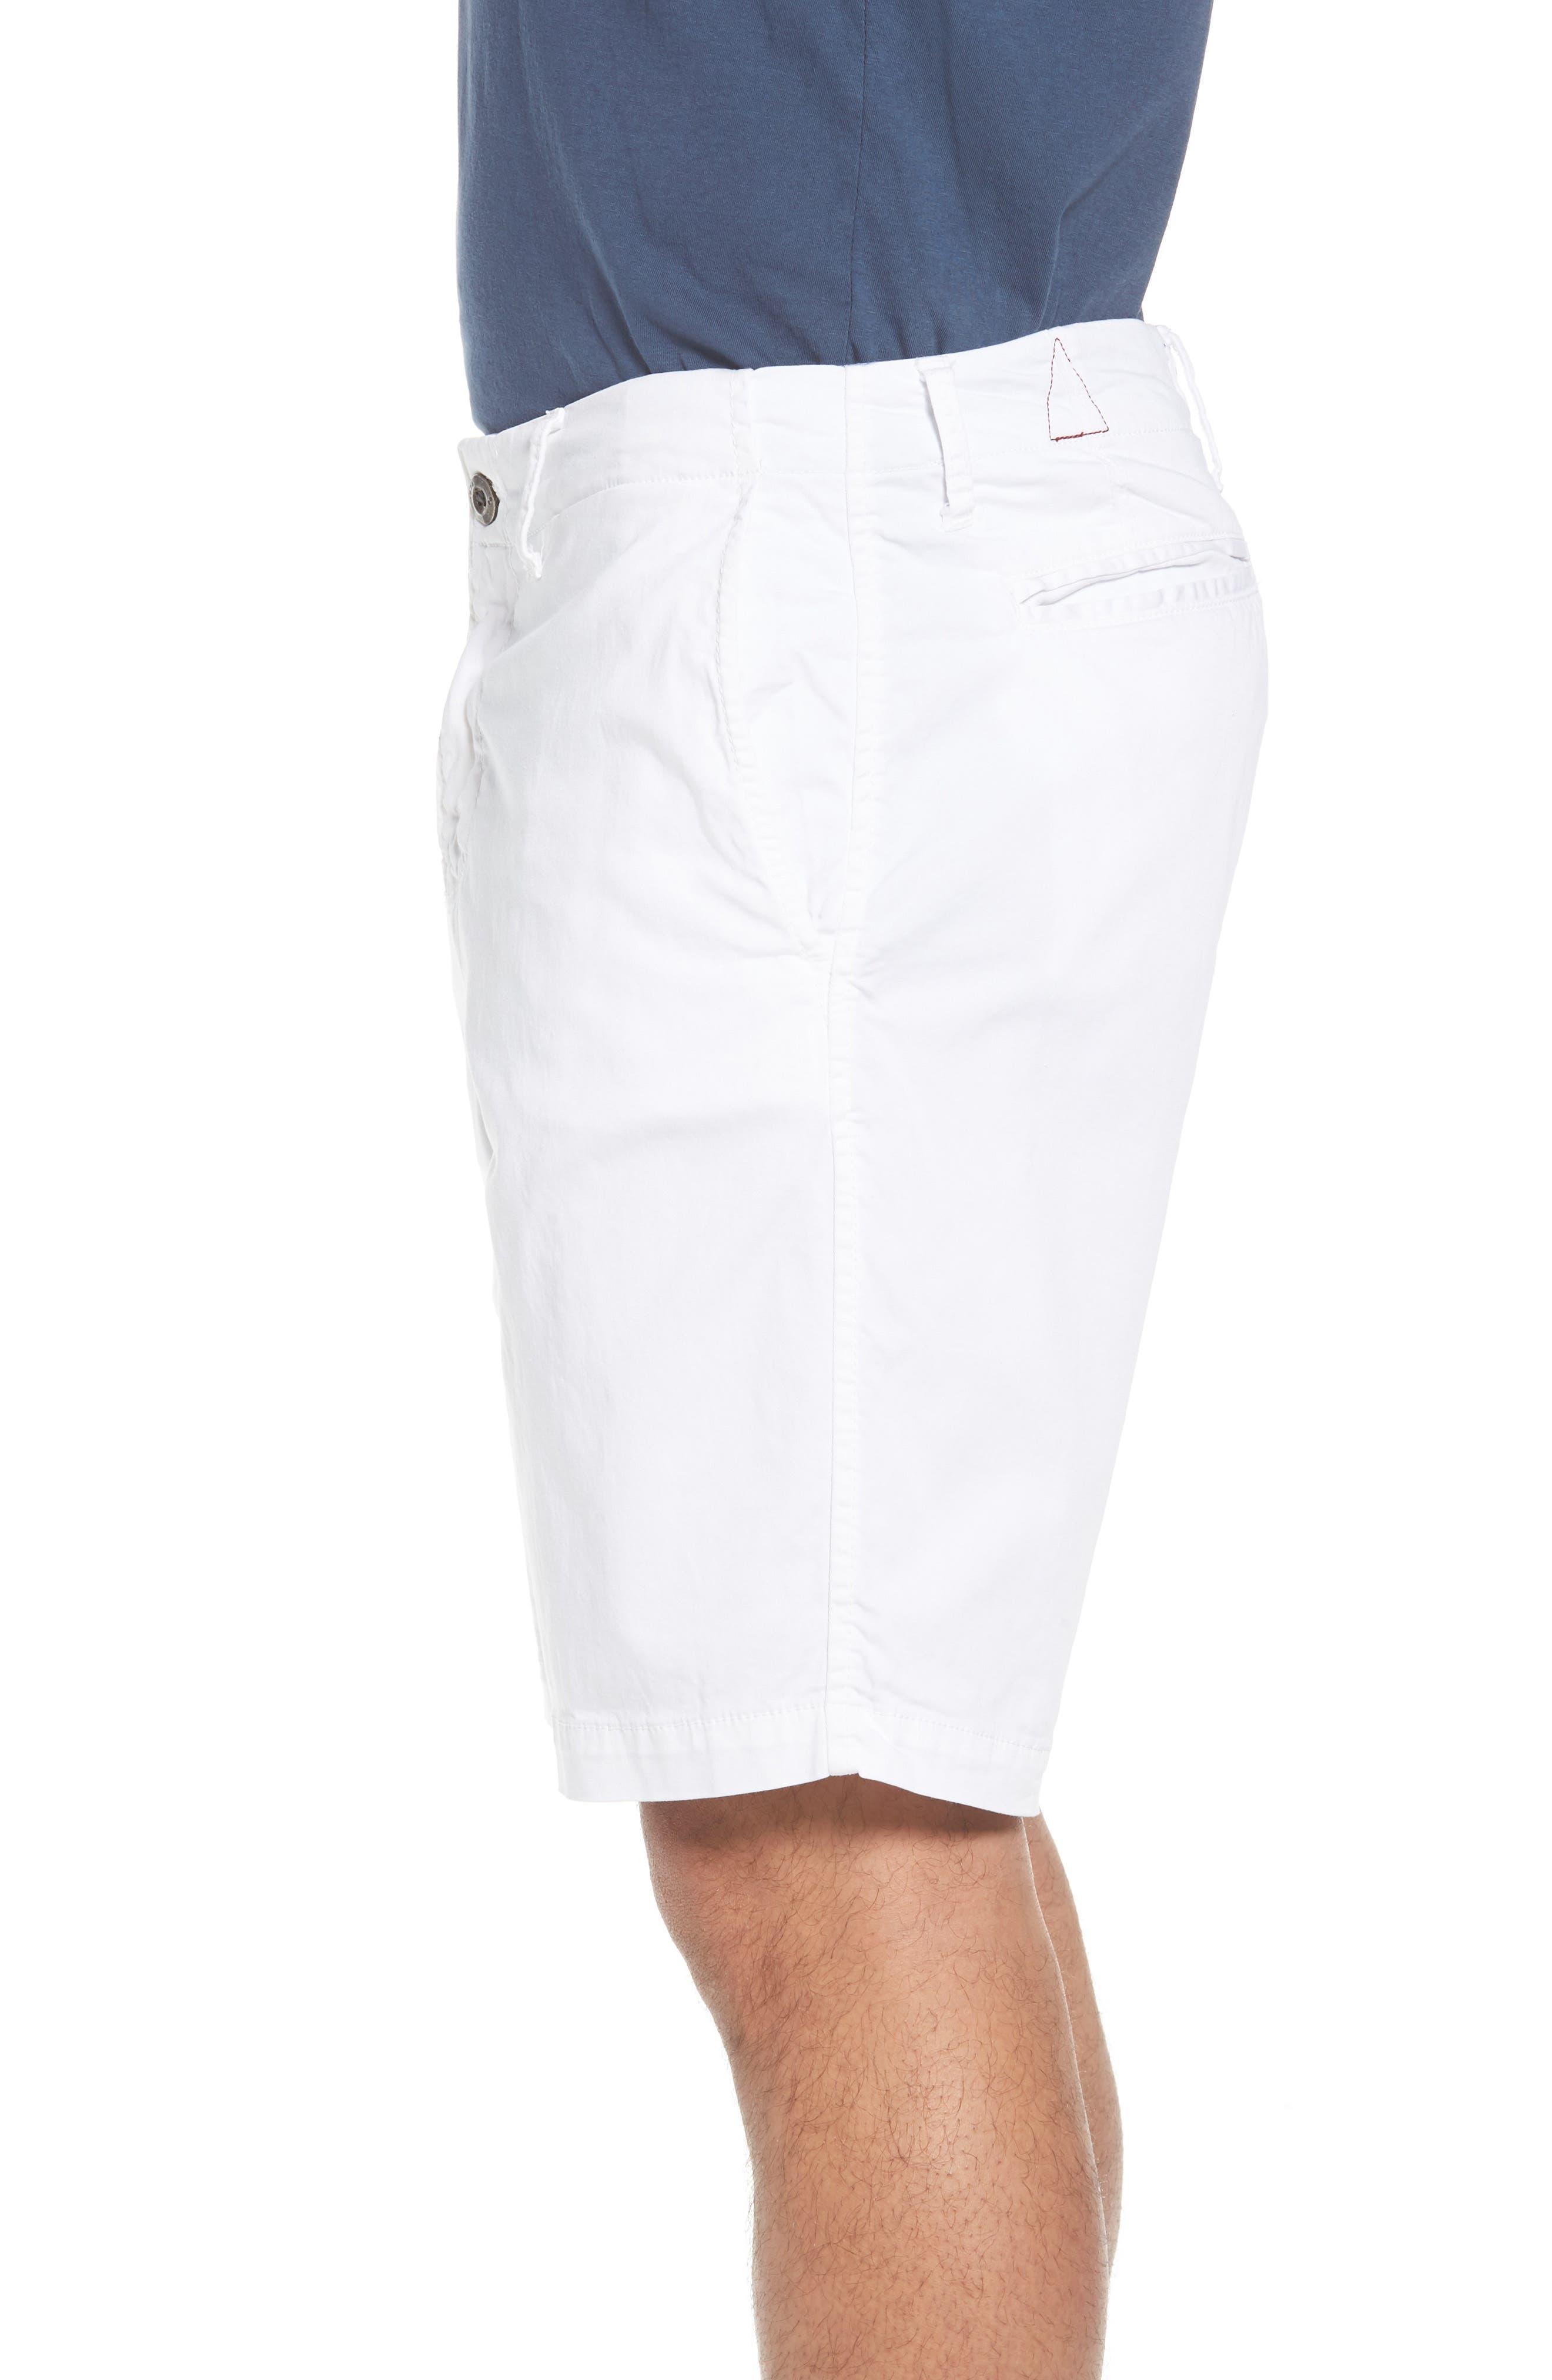 St. Barts Twill Shorts,                             Alternate thumbnail 29, color,